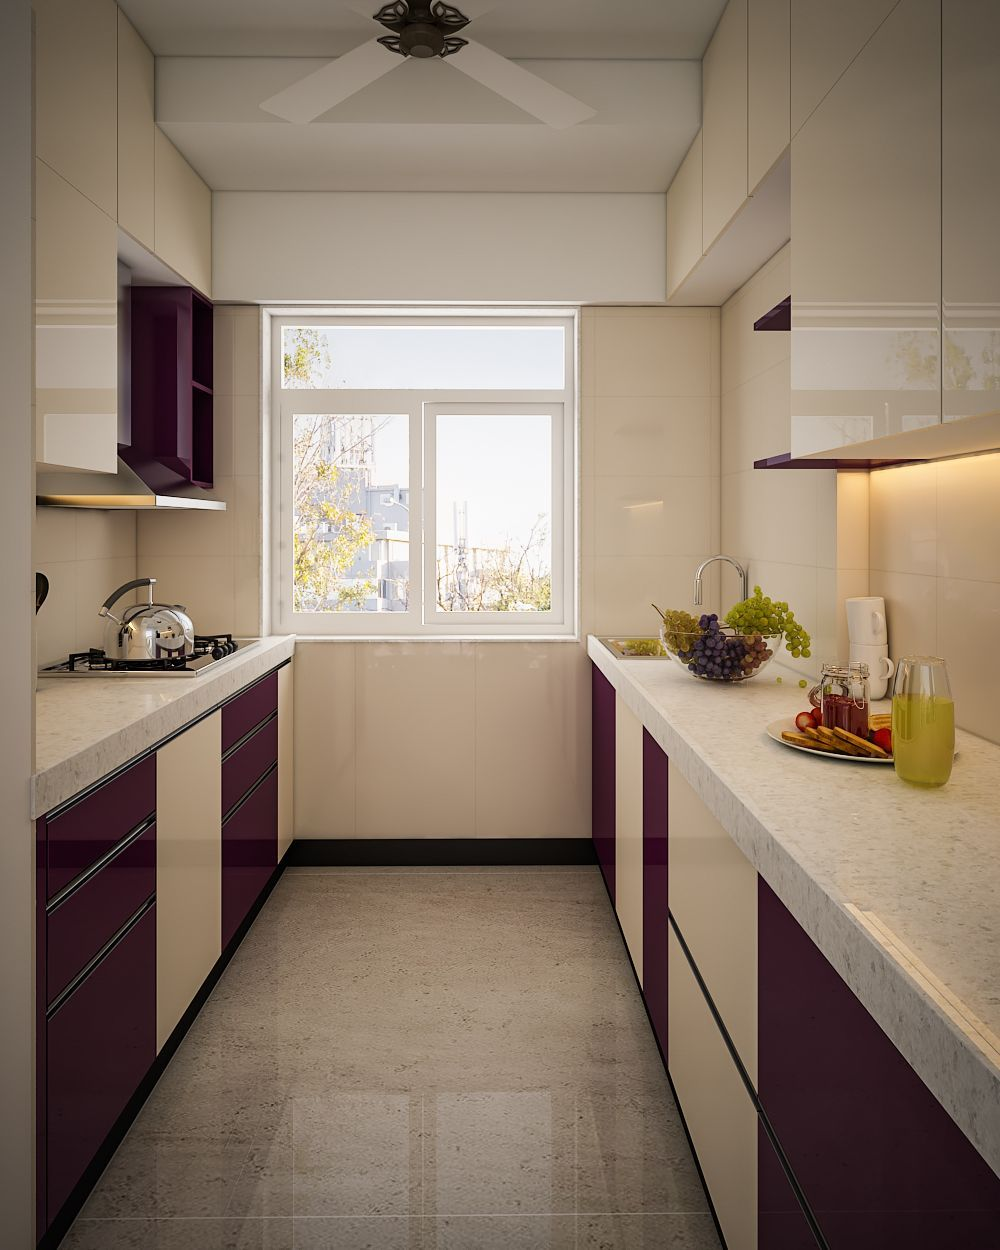 Kitchen Decor Idea 9 in 9   Simple kitchen design, Interior ...